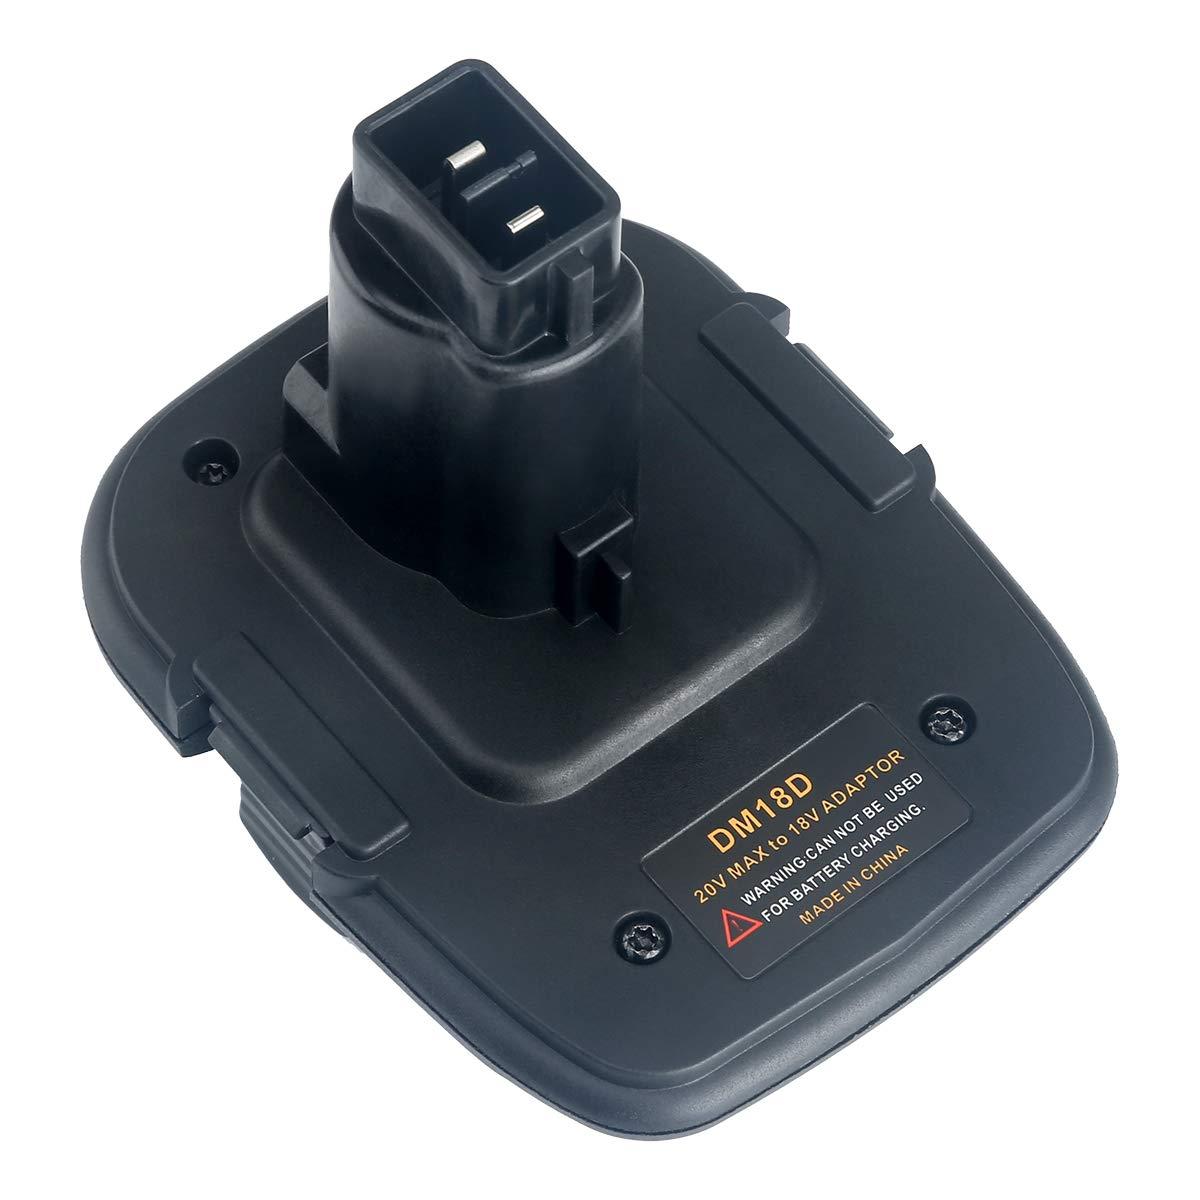 Lasica 20V Battery Adapter DCA1820 with USB port for Dewalt 18V Tools, Convert Milwaukee 18V Lithium Battery M18 DeWalt MAX 20Volt Lithium-Ion Battery DCB204 to DeWalt 18V NiCad NiMh Battery DC9096